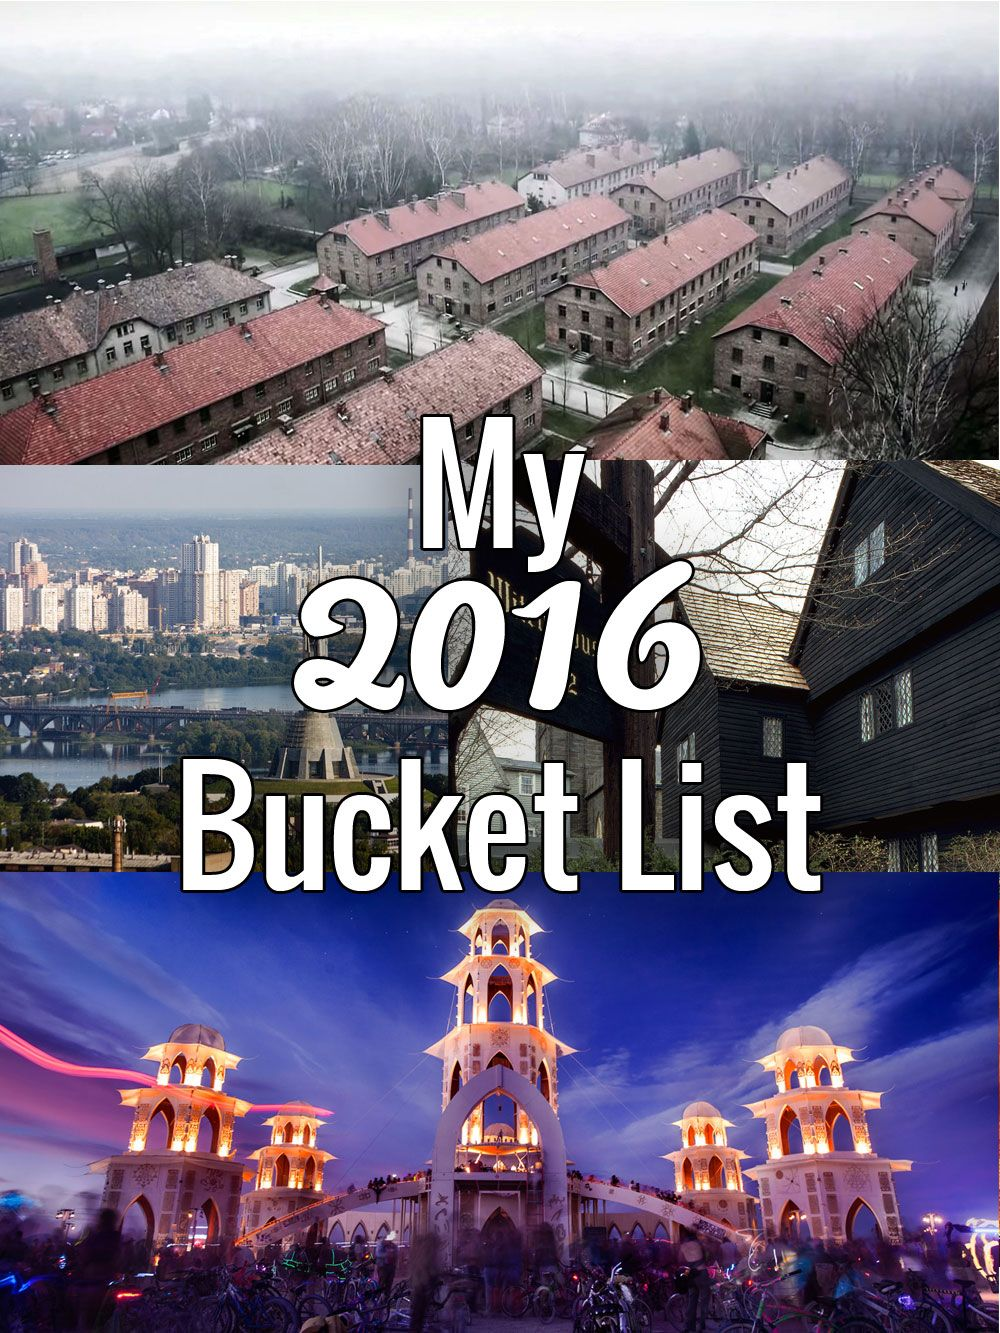 My 2016 Bucket List · Kenton de Jong Travel -My 2016 Bucket List http://kentondejong.com/blog/my-2016-bucket-list